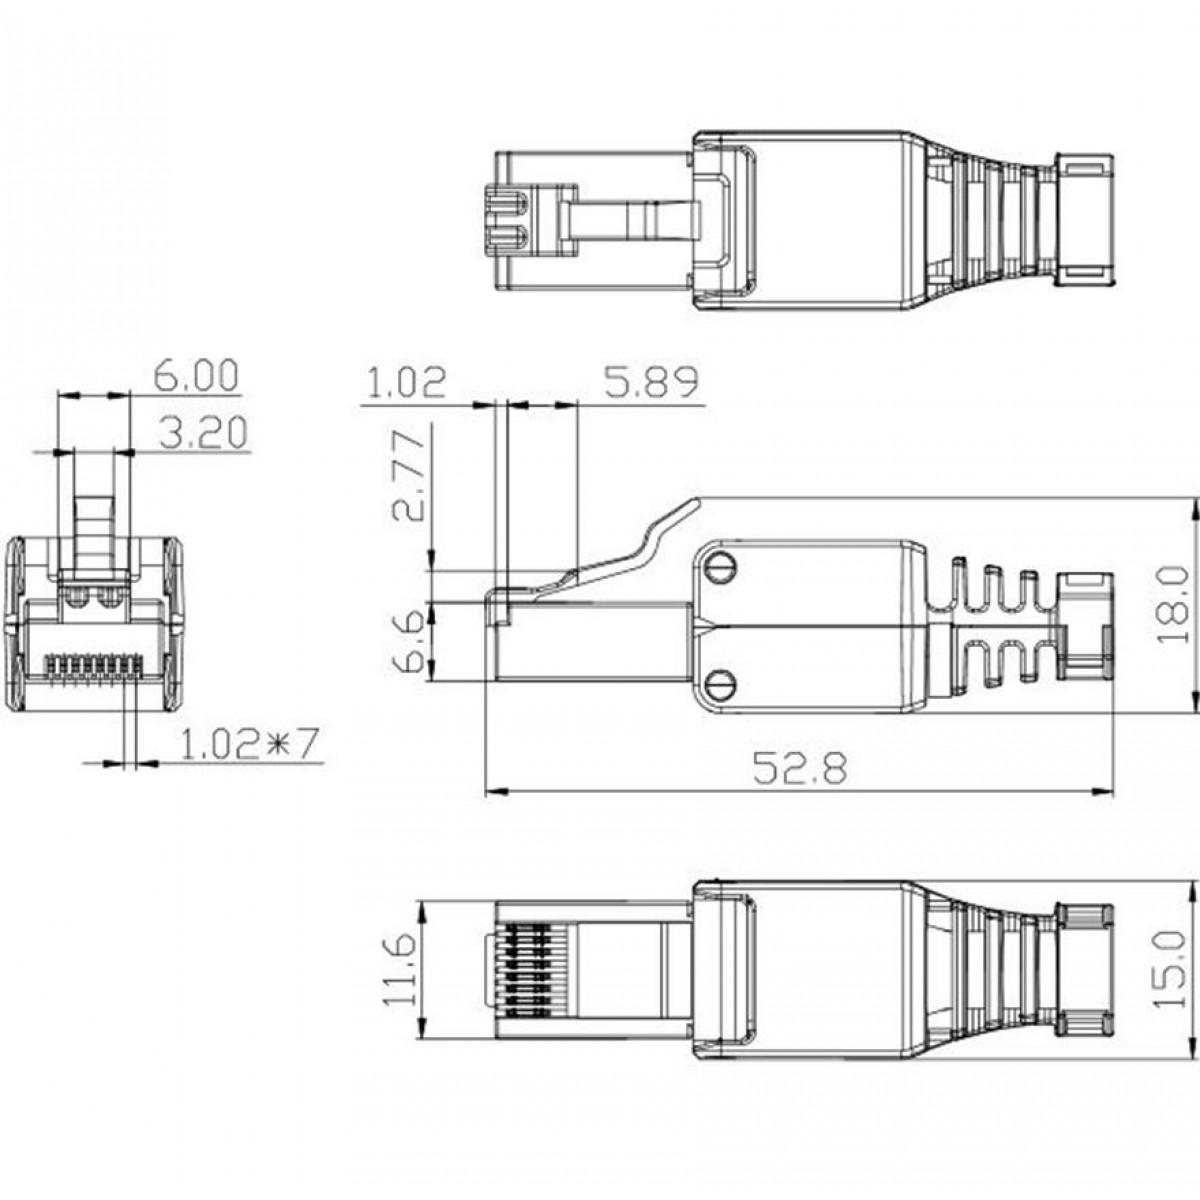 Rj45 Box Wiring